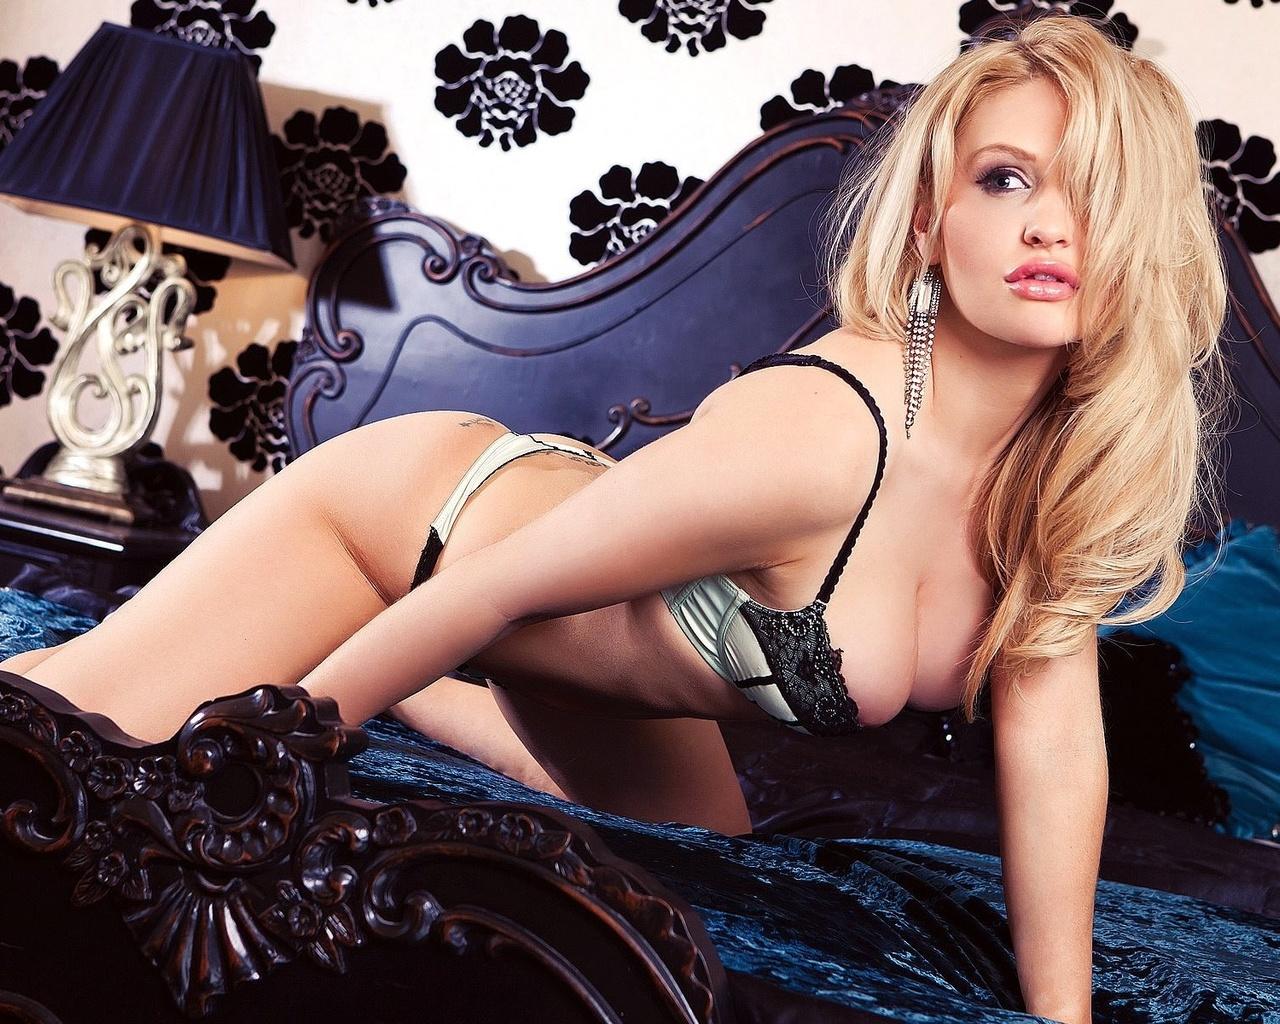 блондинка, взгляд, грудь, ножки, поза